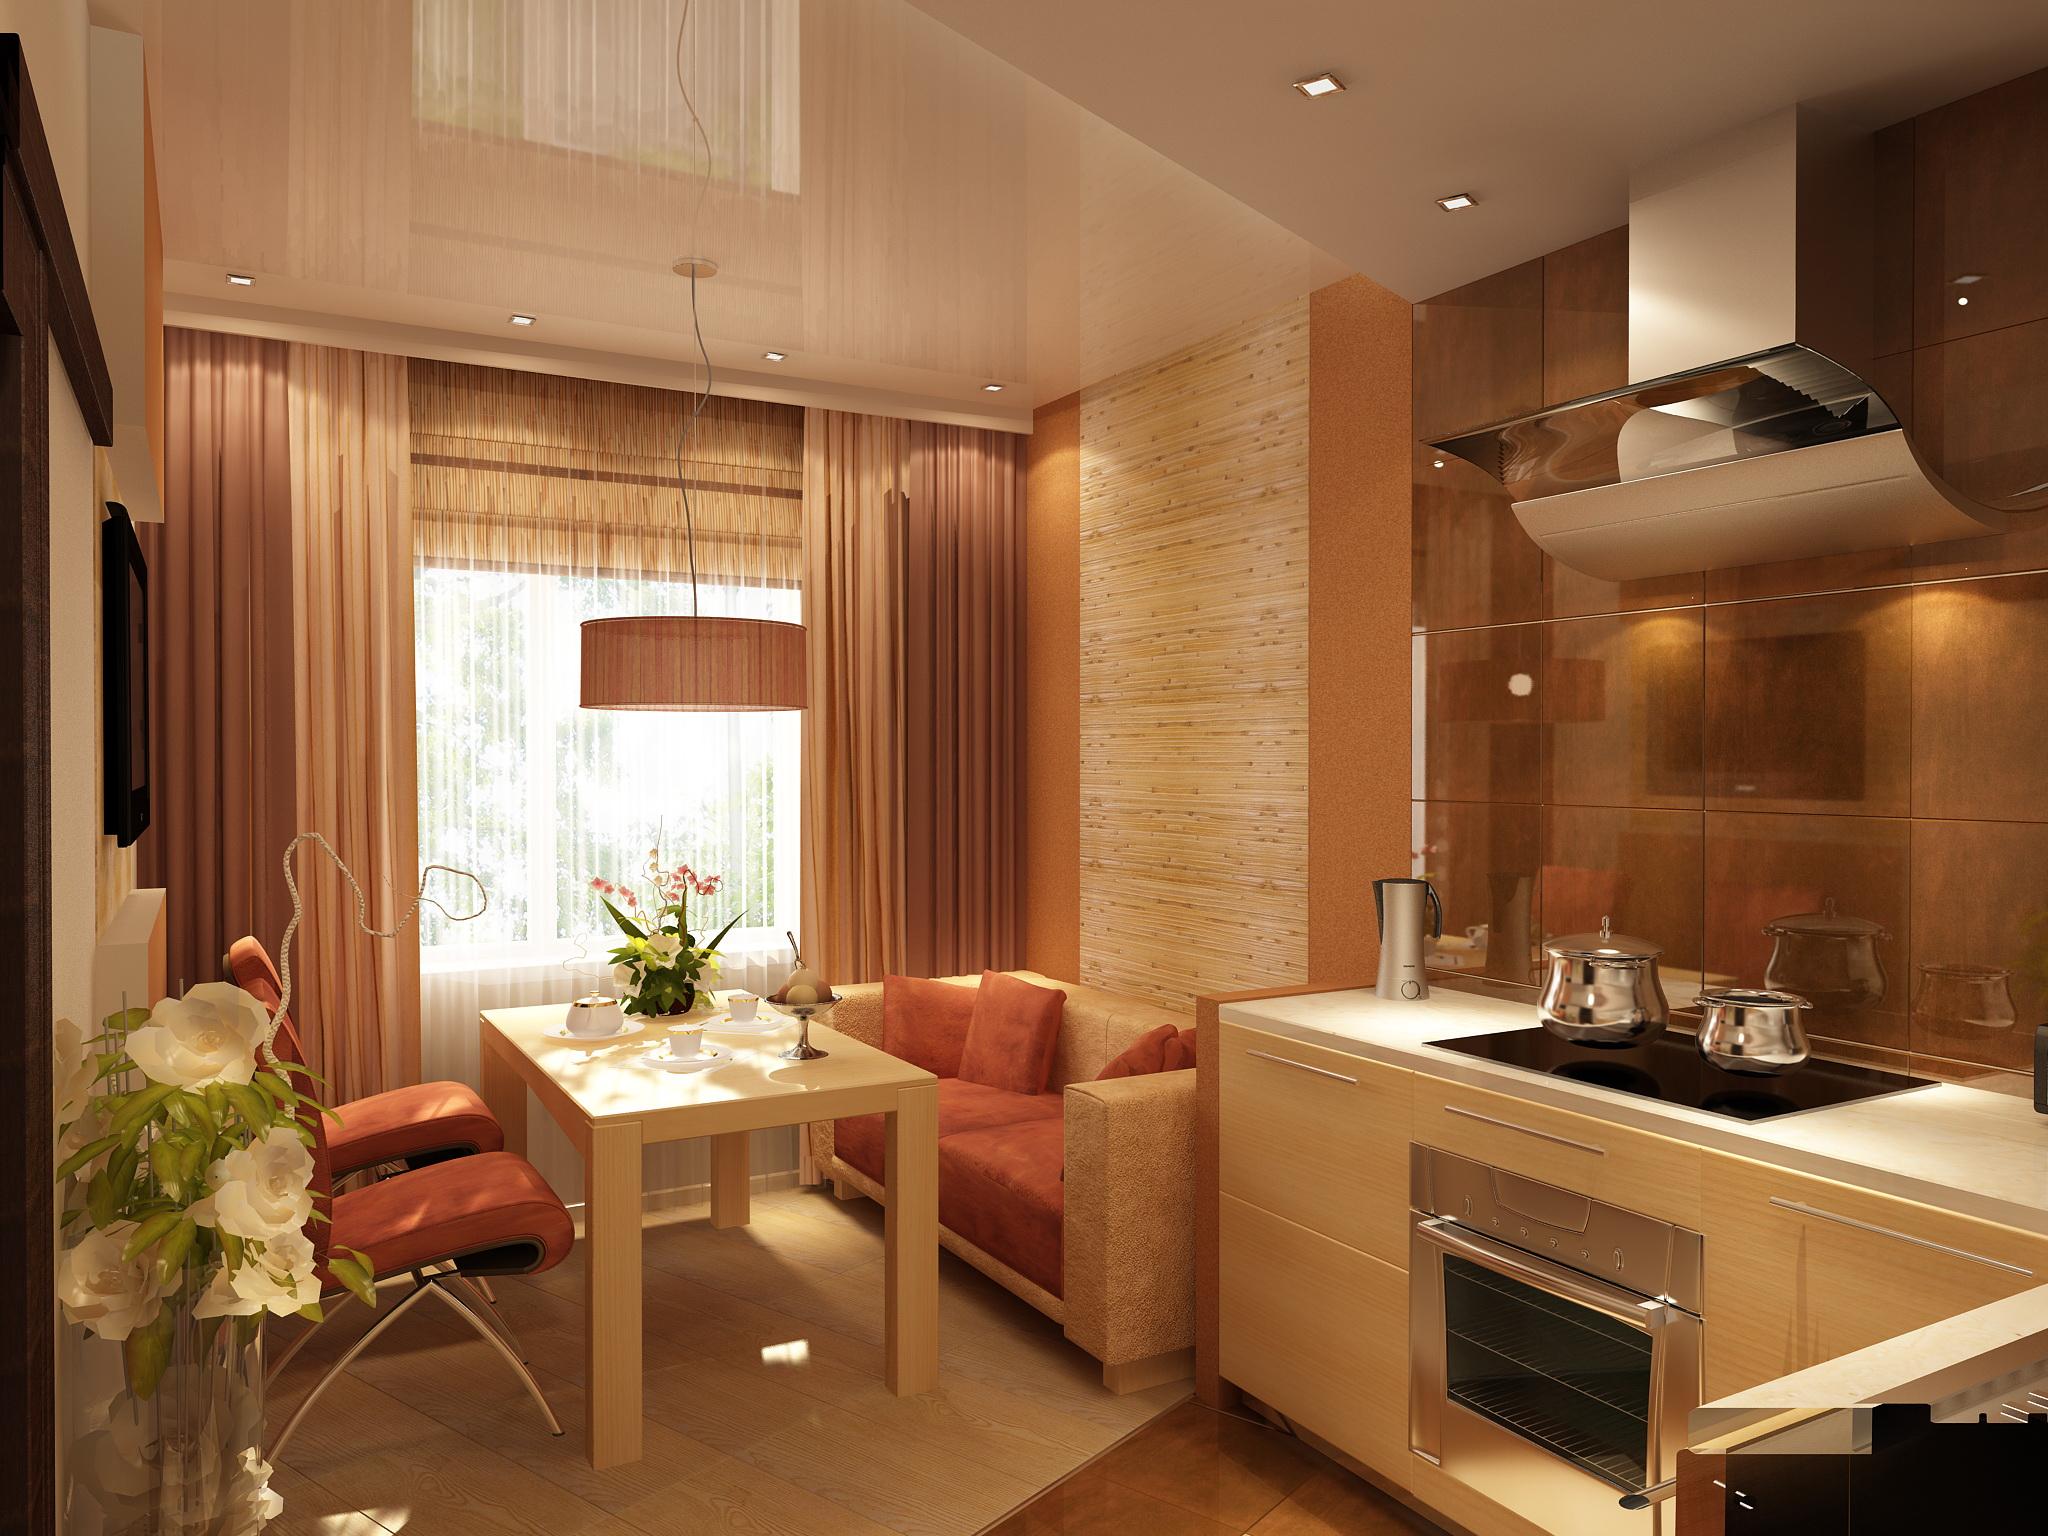 Дизайн кухни 8 кв м фото с холодильником youtube in метров 7.